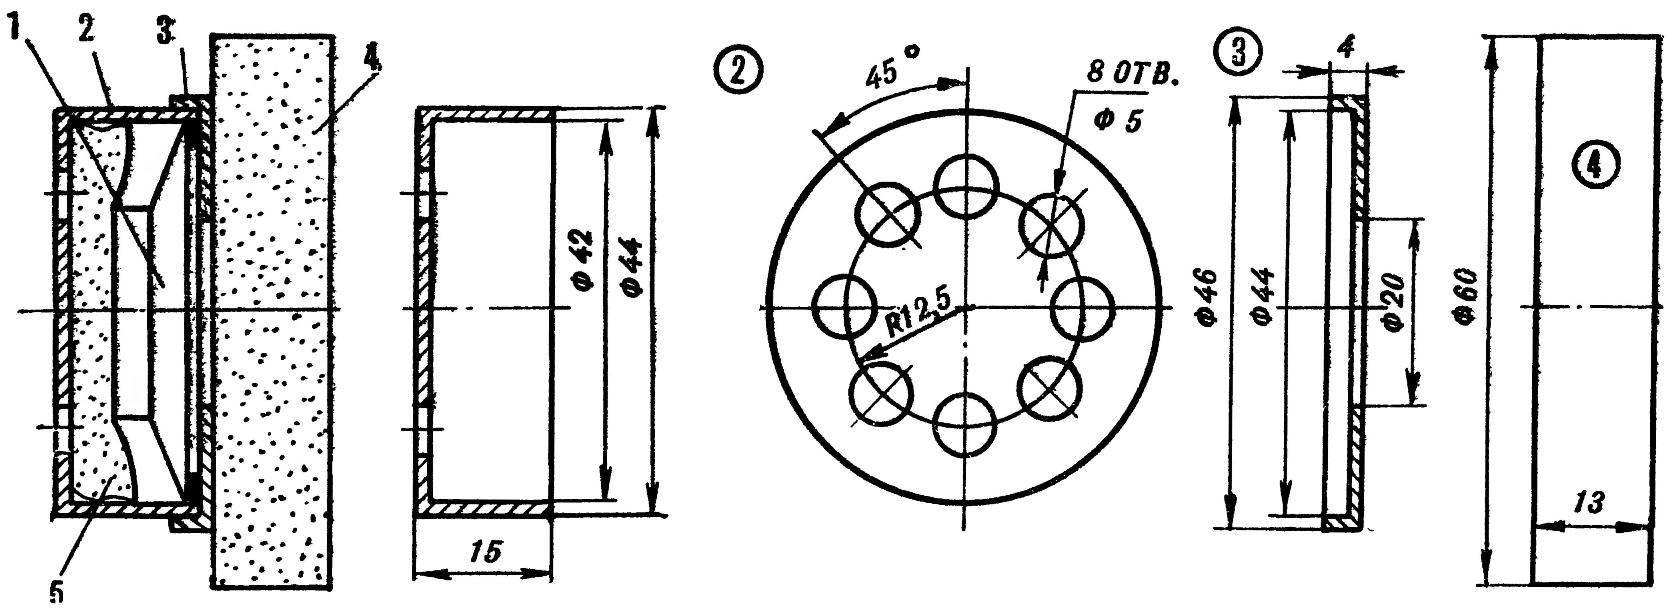 Рис. 3. Конструкция телефона на базе головки 0,05ГД-1